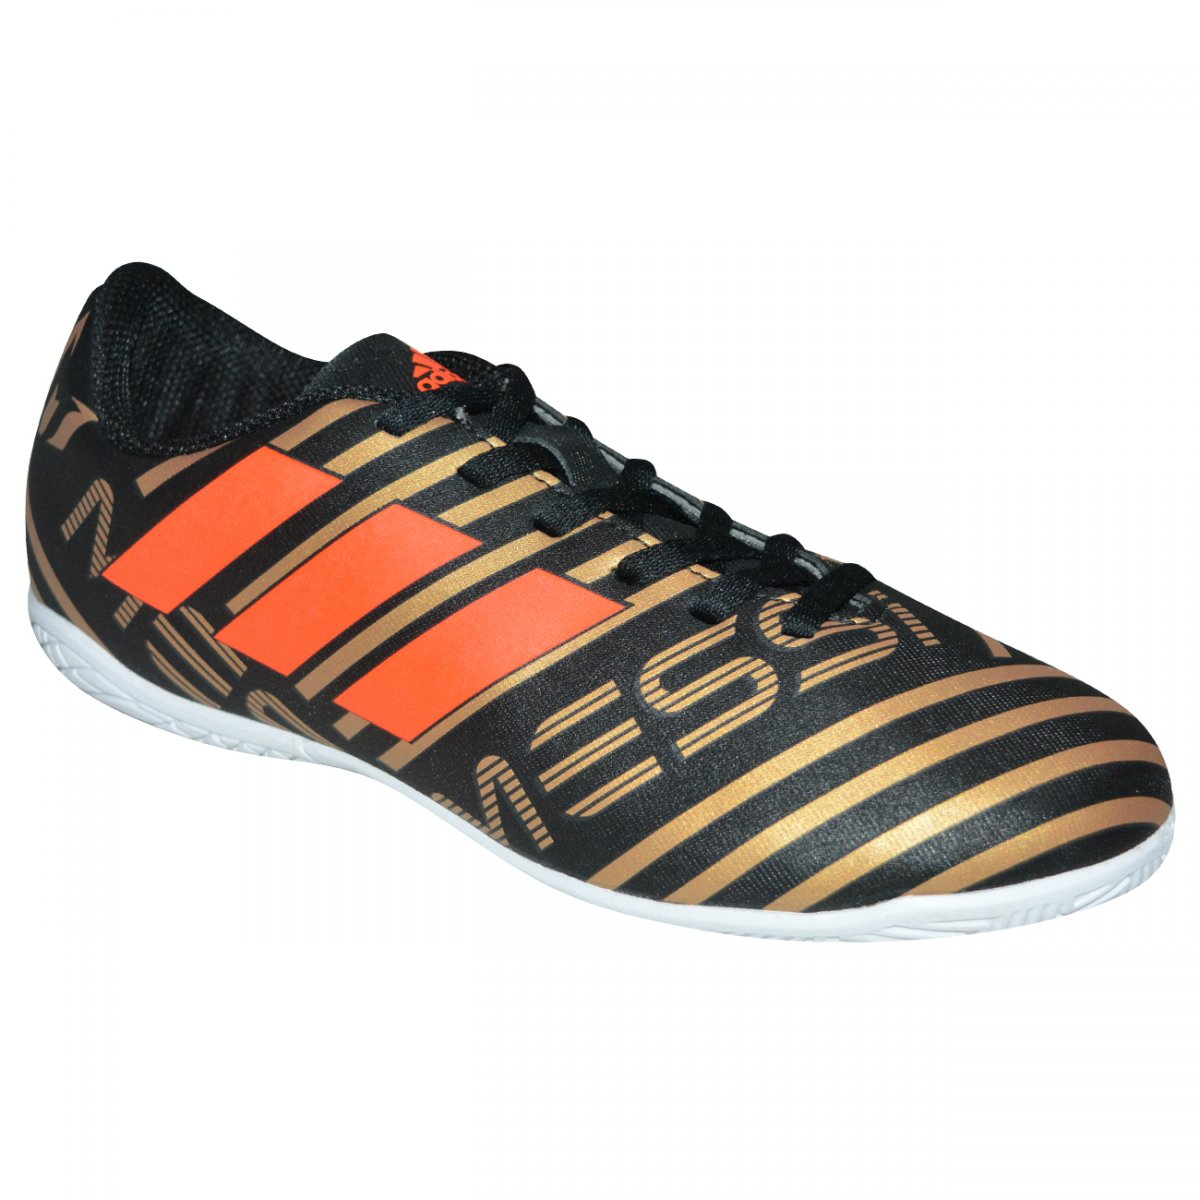 3742982b36ae3 Tenis Adidas Nemeziz Messi Tango 17.4 Juvenil CP9224 - Preto dourado laranja  - Chuteira Nike